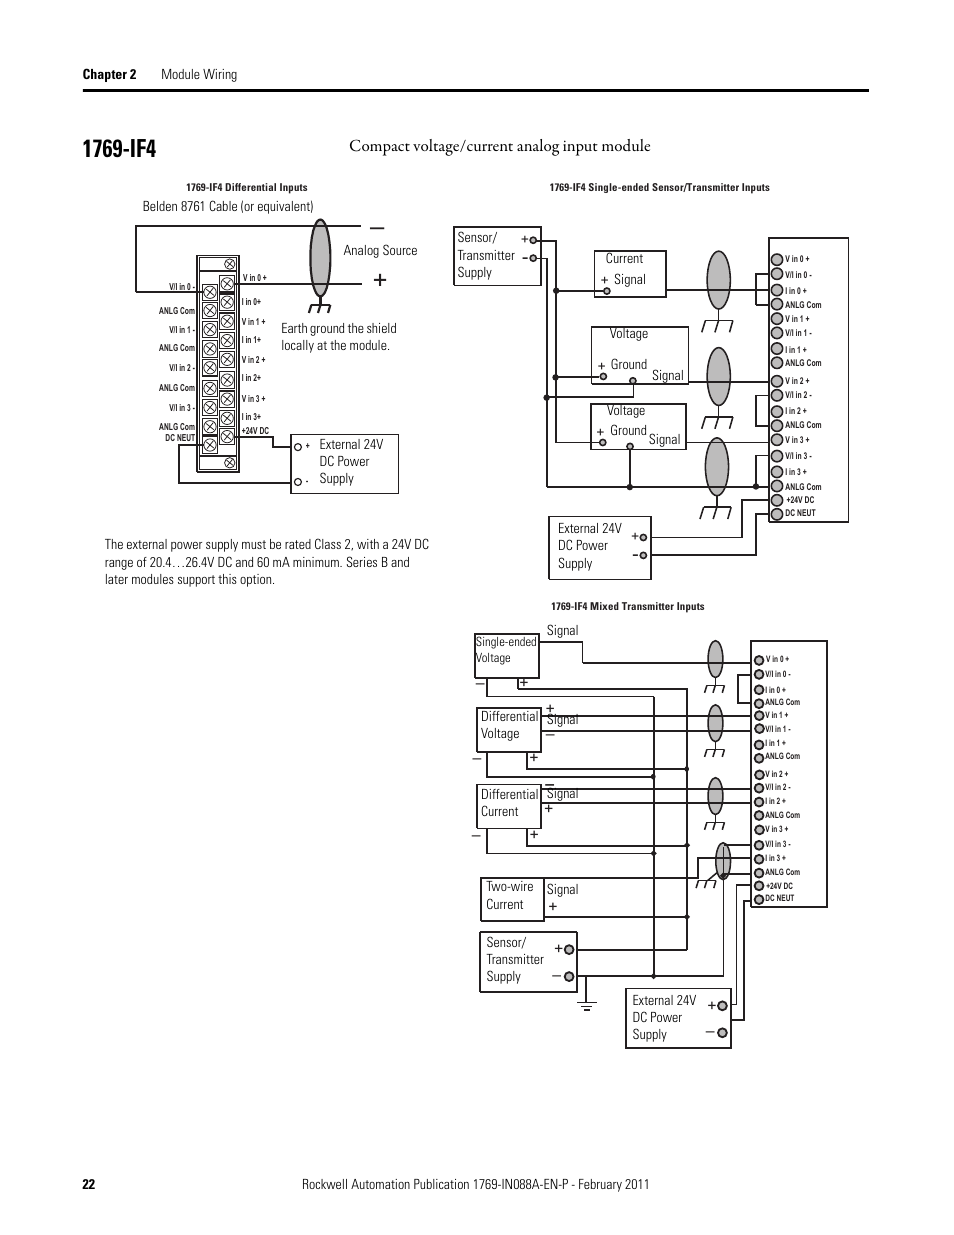 1769 current analog input module